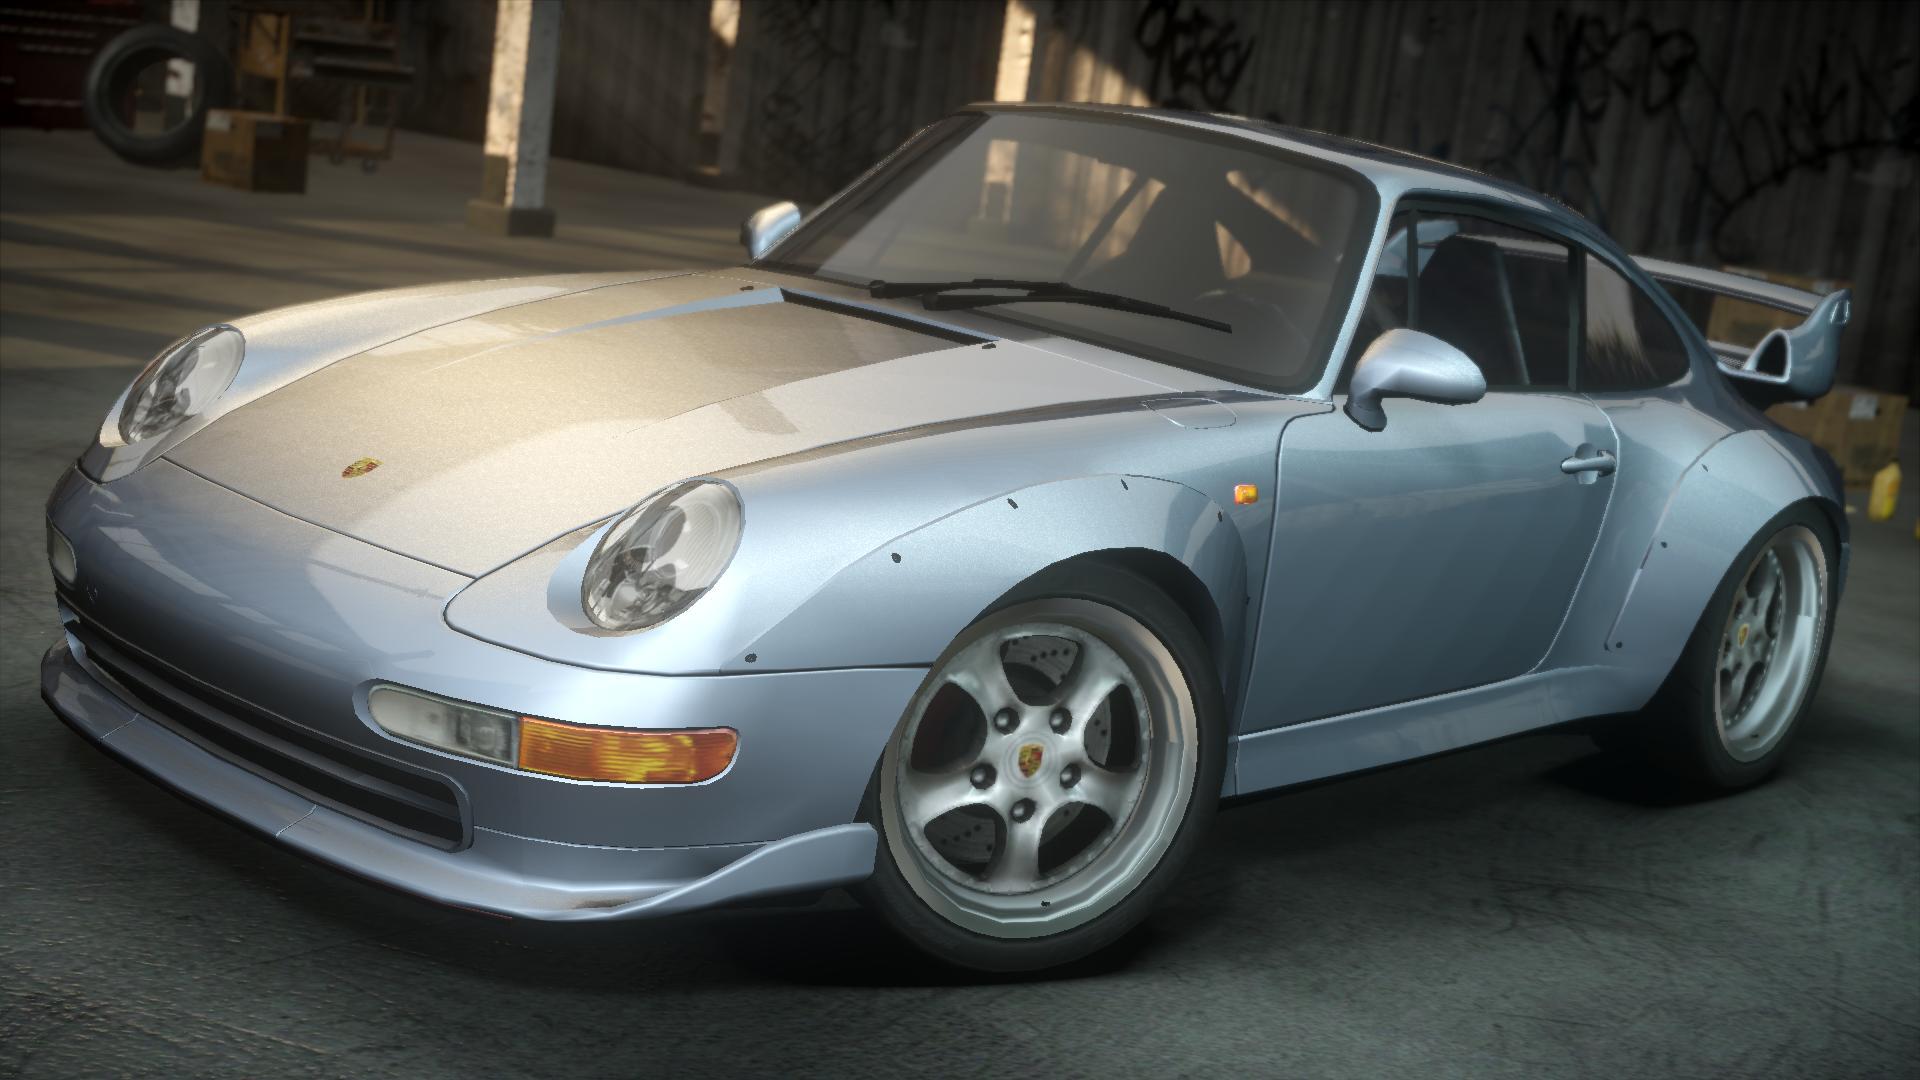 Porsche 911 GT2 (993) | Need for Sd Wiki | FANDOM powered by Wikia